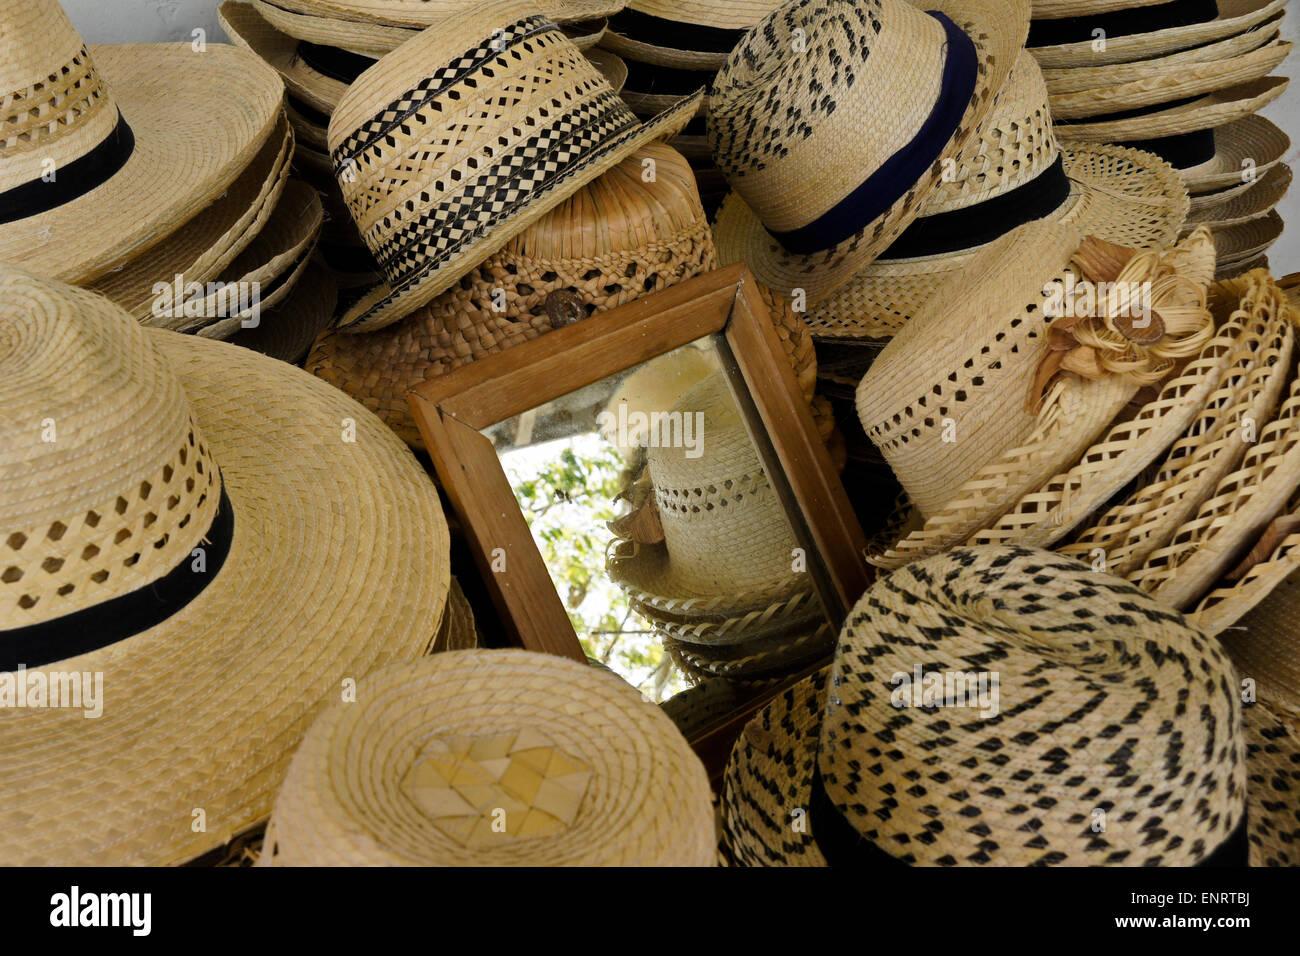 Straw Hats For Sale Imágenes De Stock   Straw Hats For Sale Fotos De ... 9fed00009d4